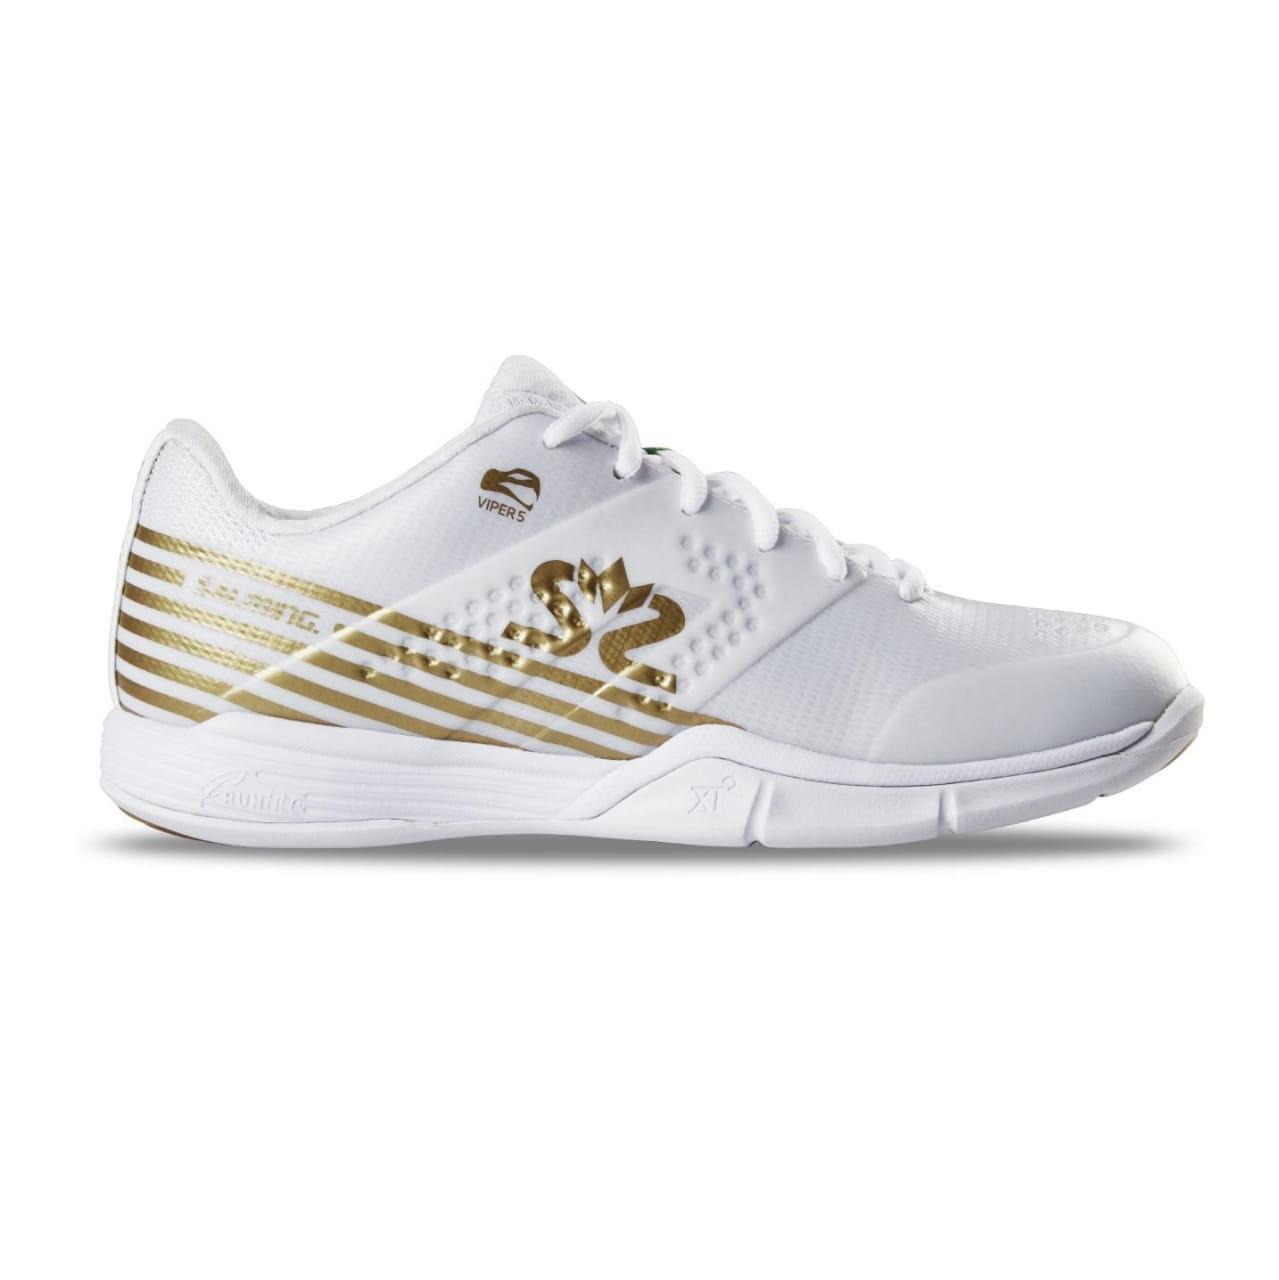 Halová obuv Salming Viper 5 Shoe Women White/Gold